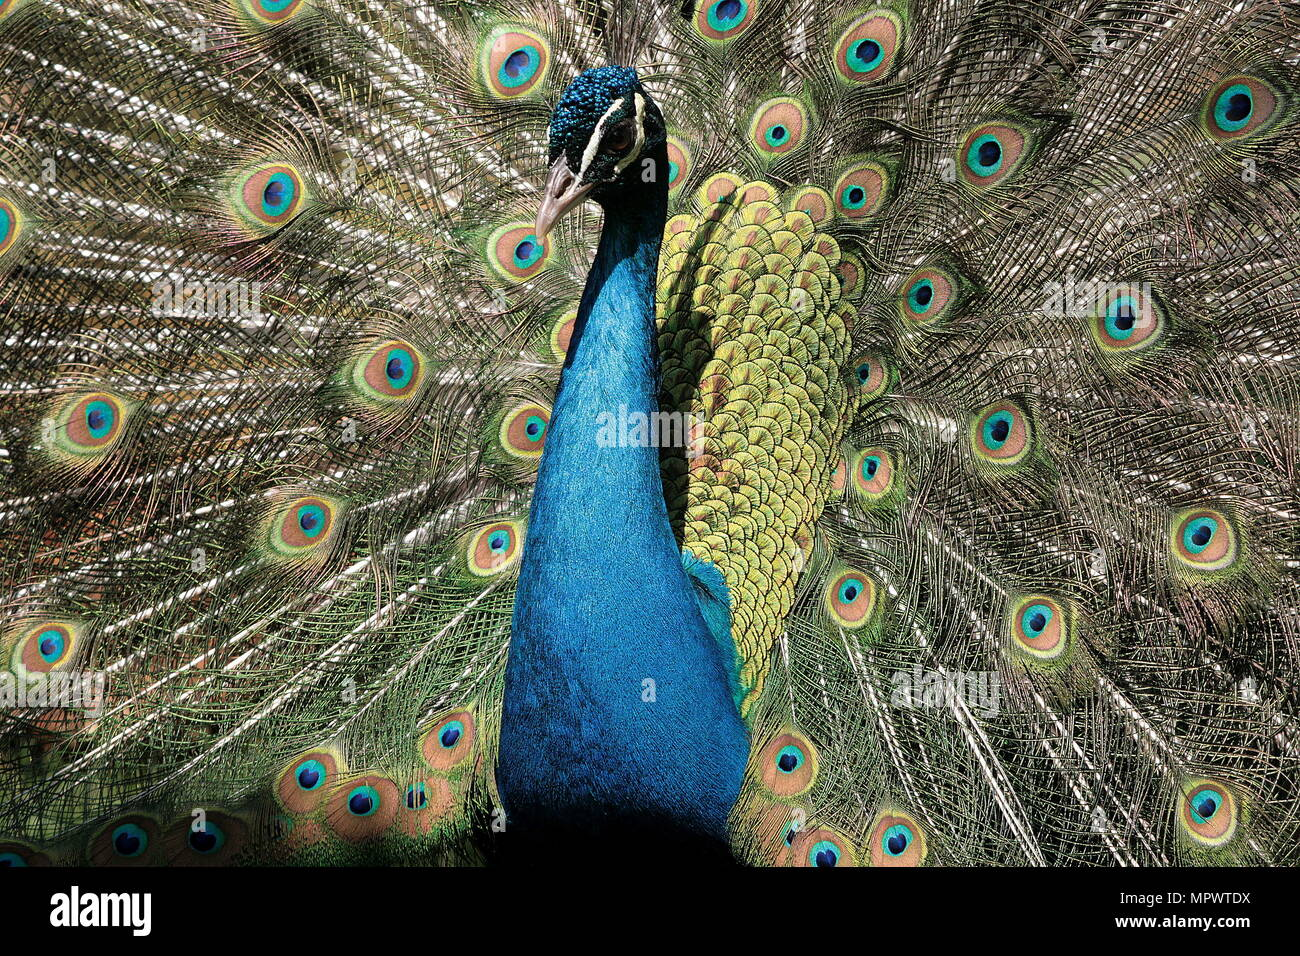 Brilliant eye maze of the peacocks feathers Stock Photo